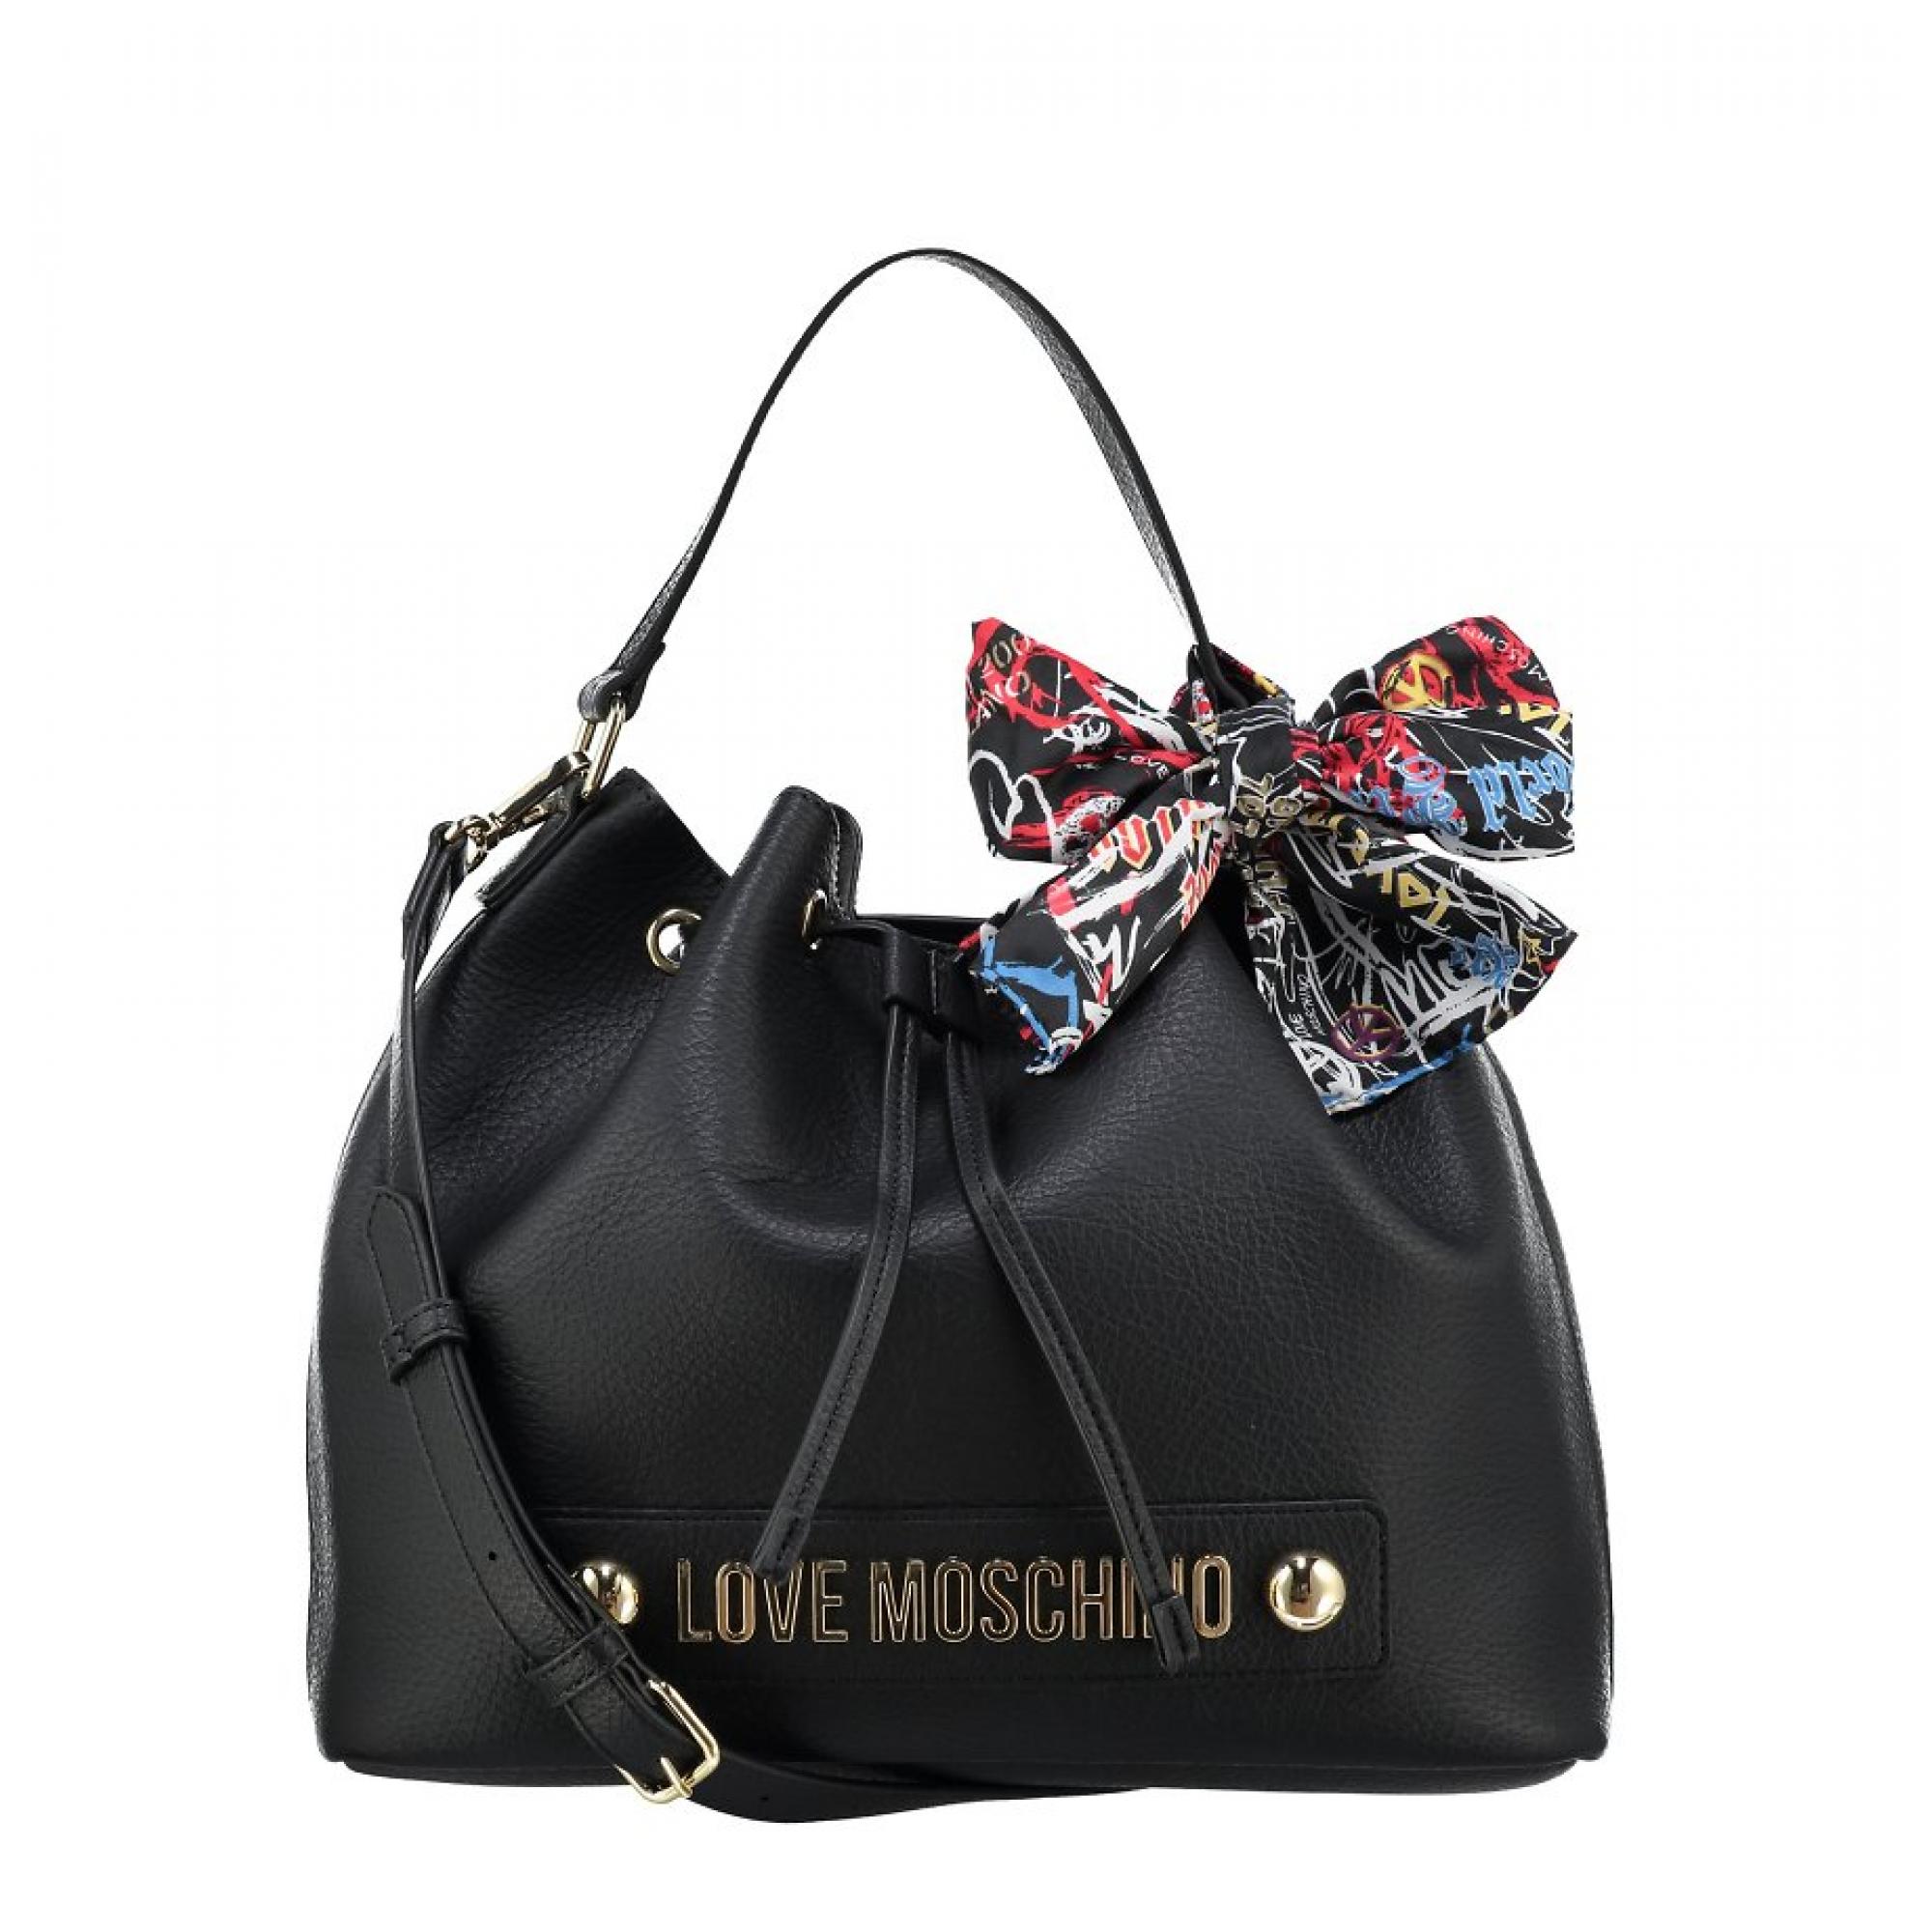 Love Stampa Borsa Moschino Logo Jc4122pp16lv Secchiello Foulard QdCeoBrxW